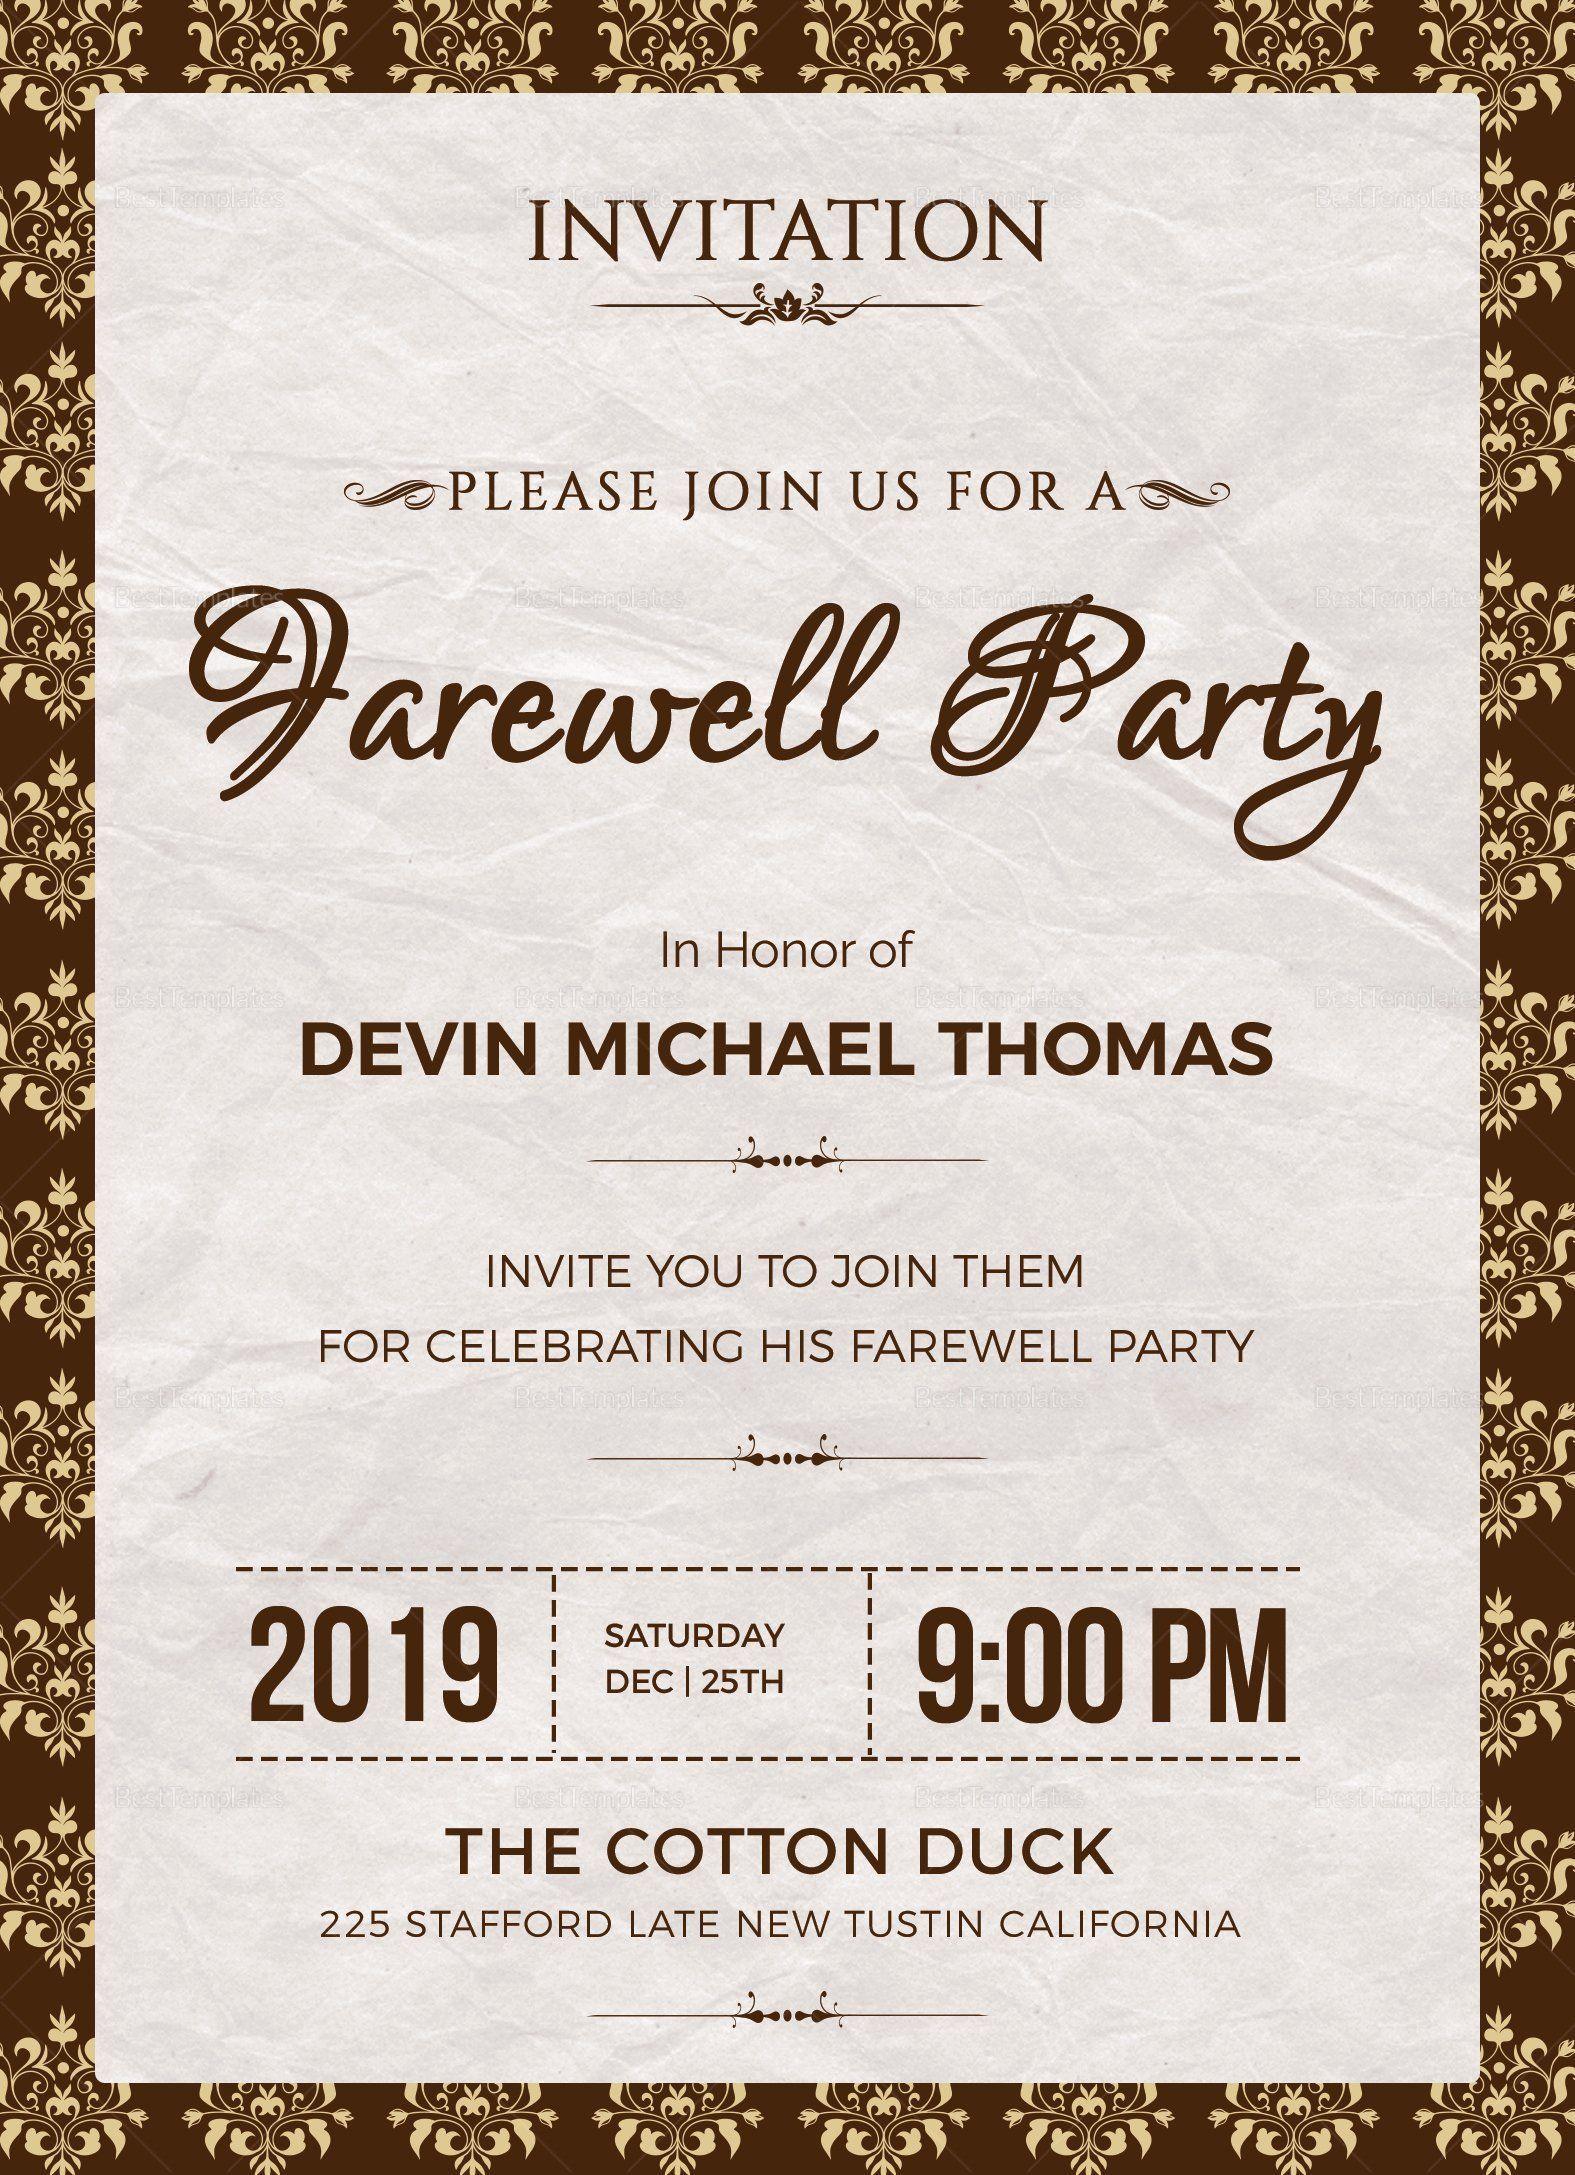 005 Phenomenal Retirement Party Invitation Template Free Printable Inspiration Full